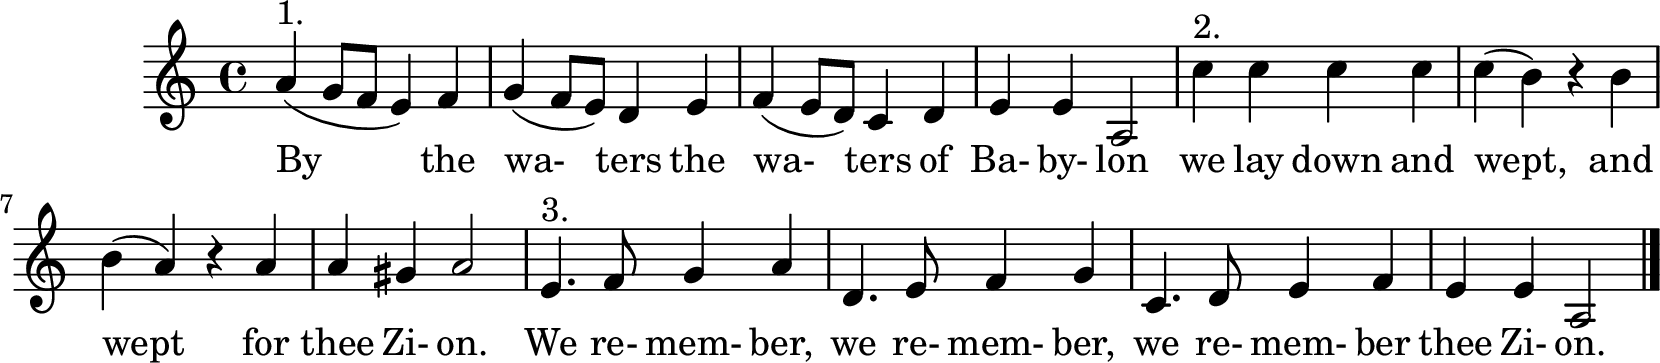 Notenblatt Music Sheet By the waters